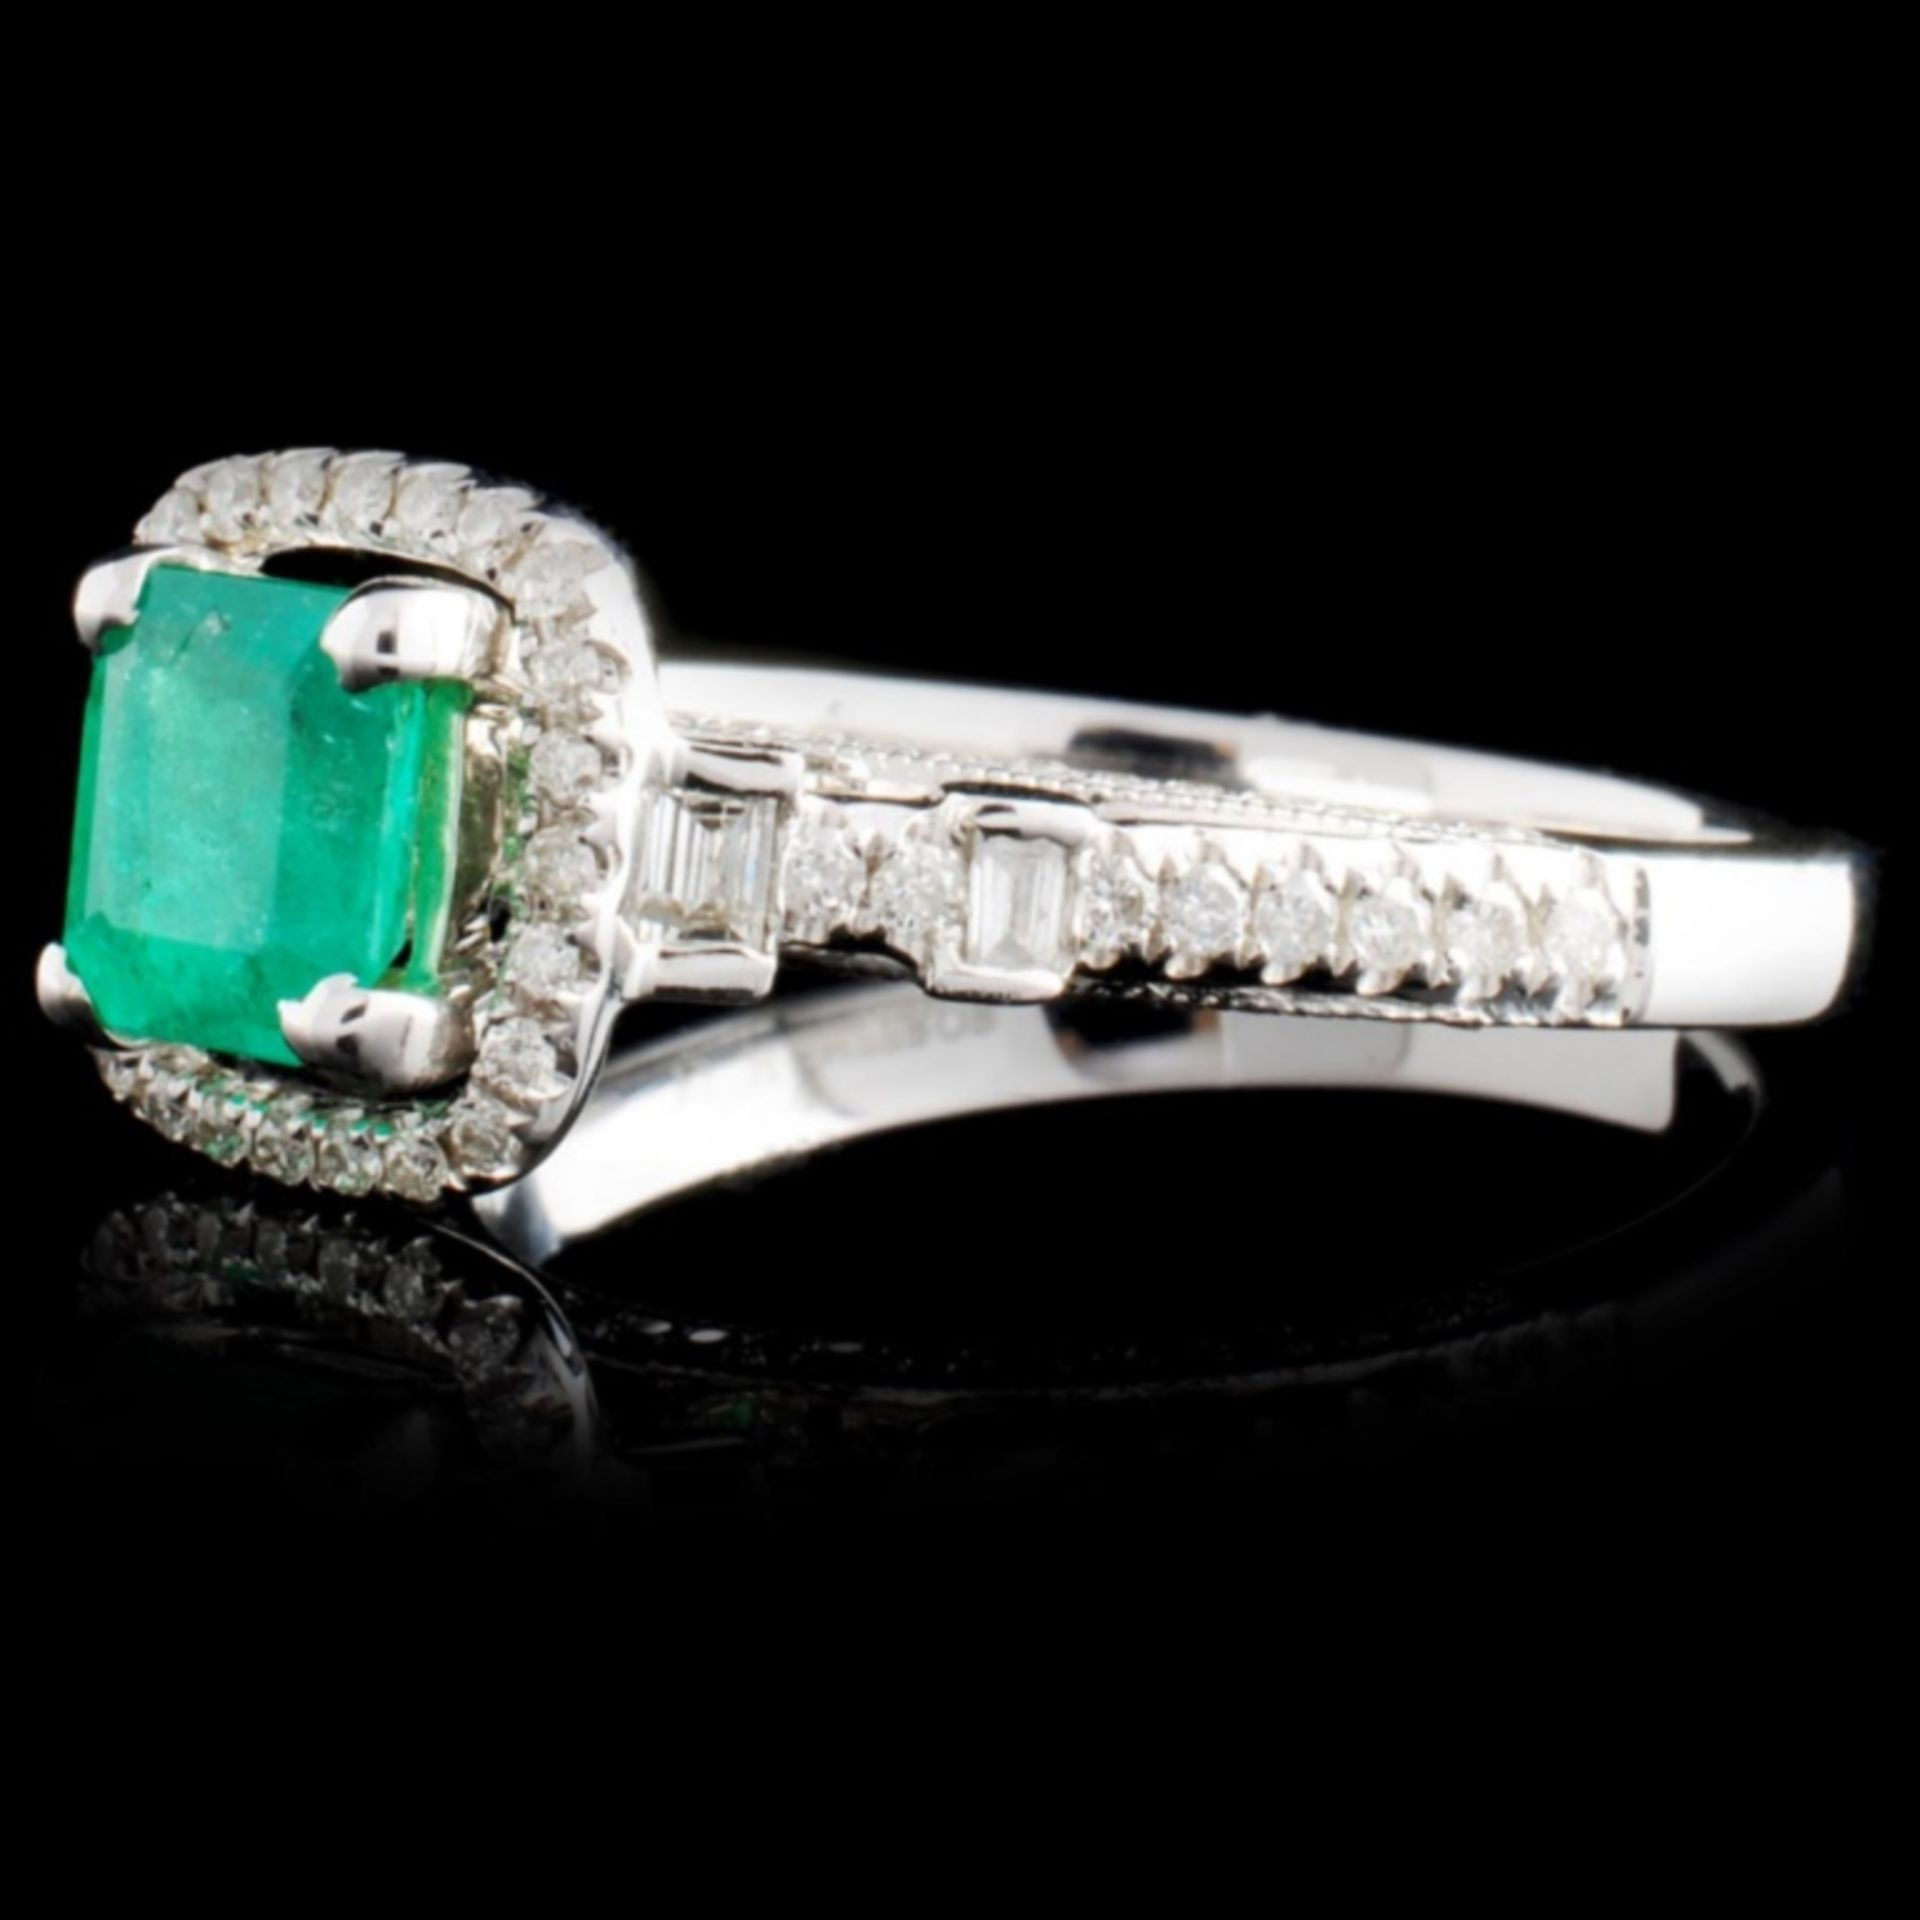 18K White Gold 0.69ct Emerald & 0.41ct Diamond Rin - Image 2 of 4